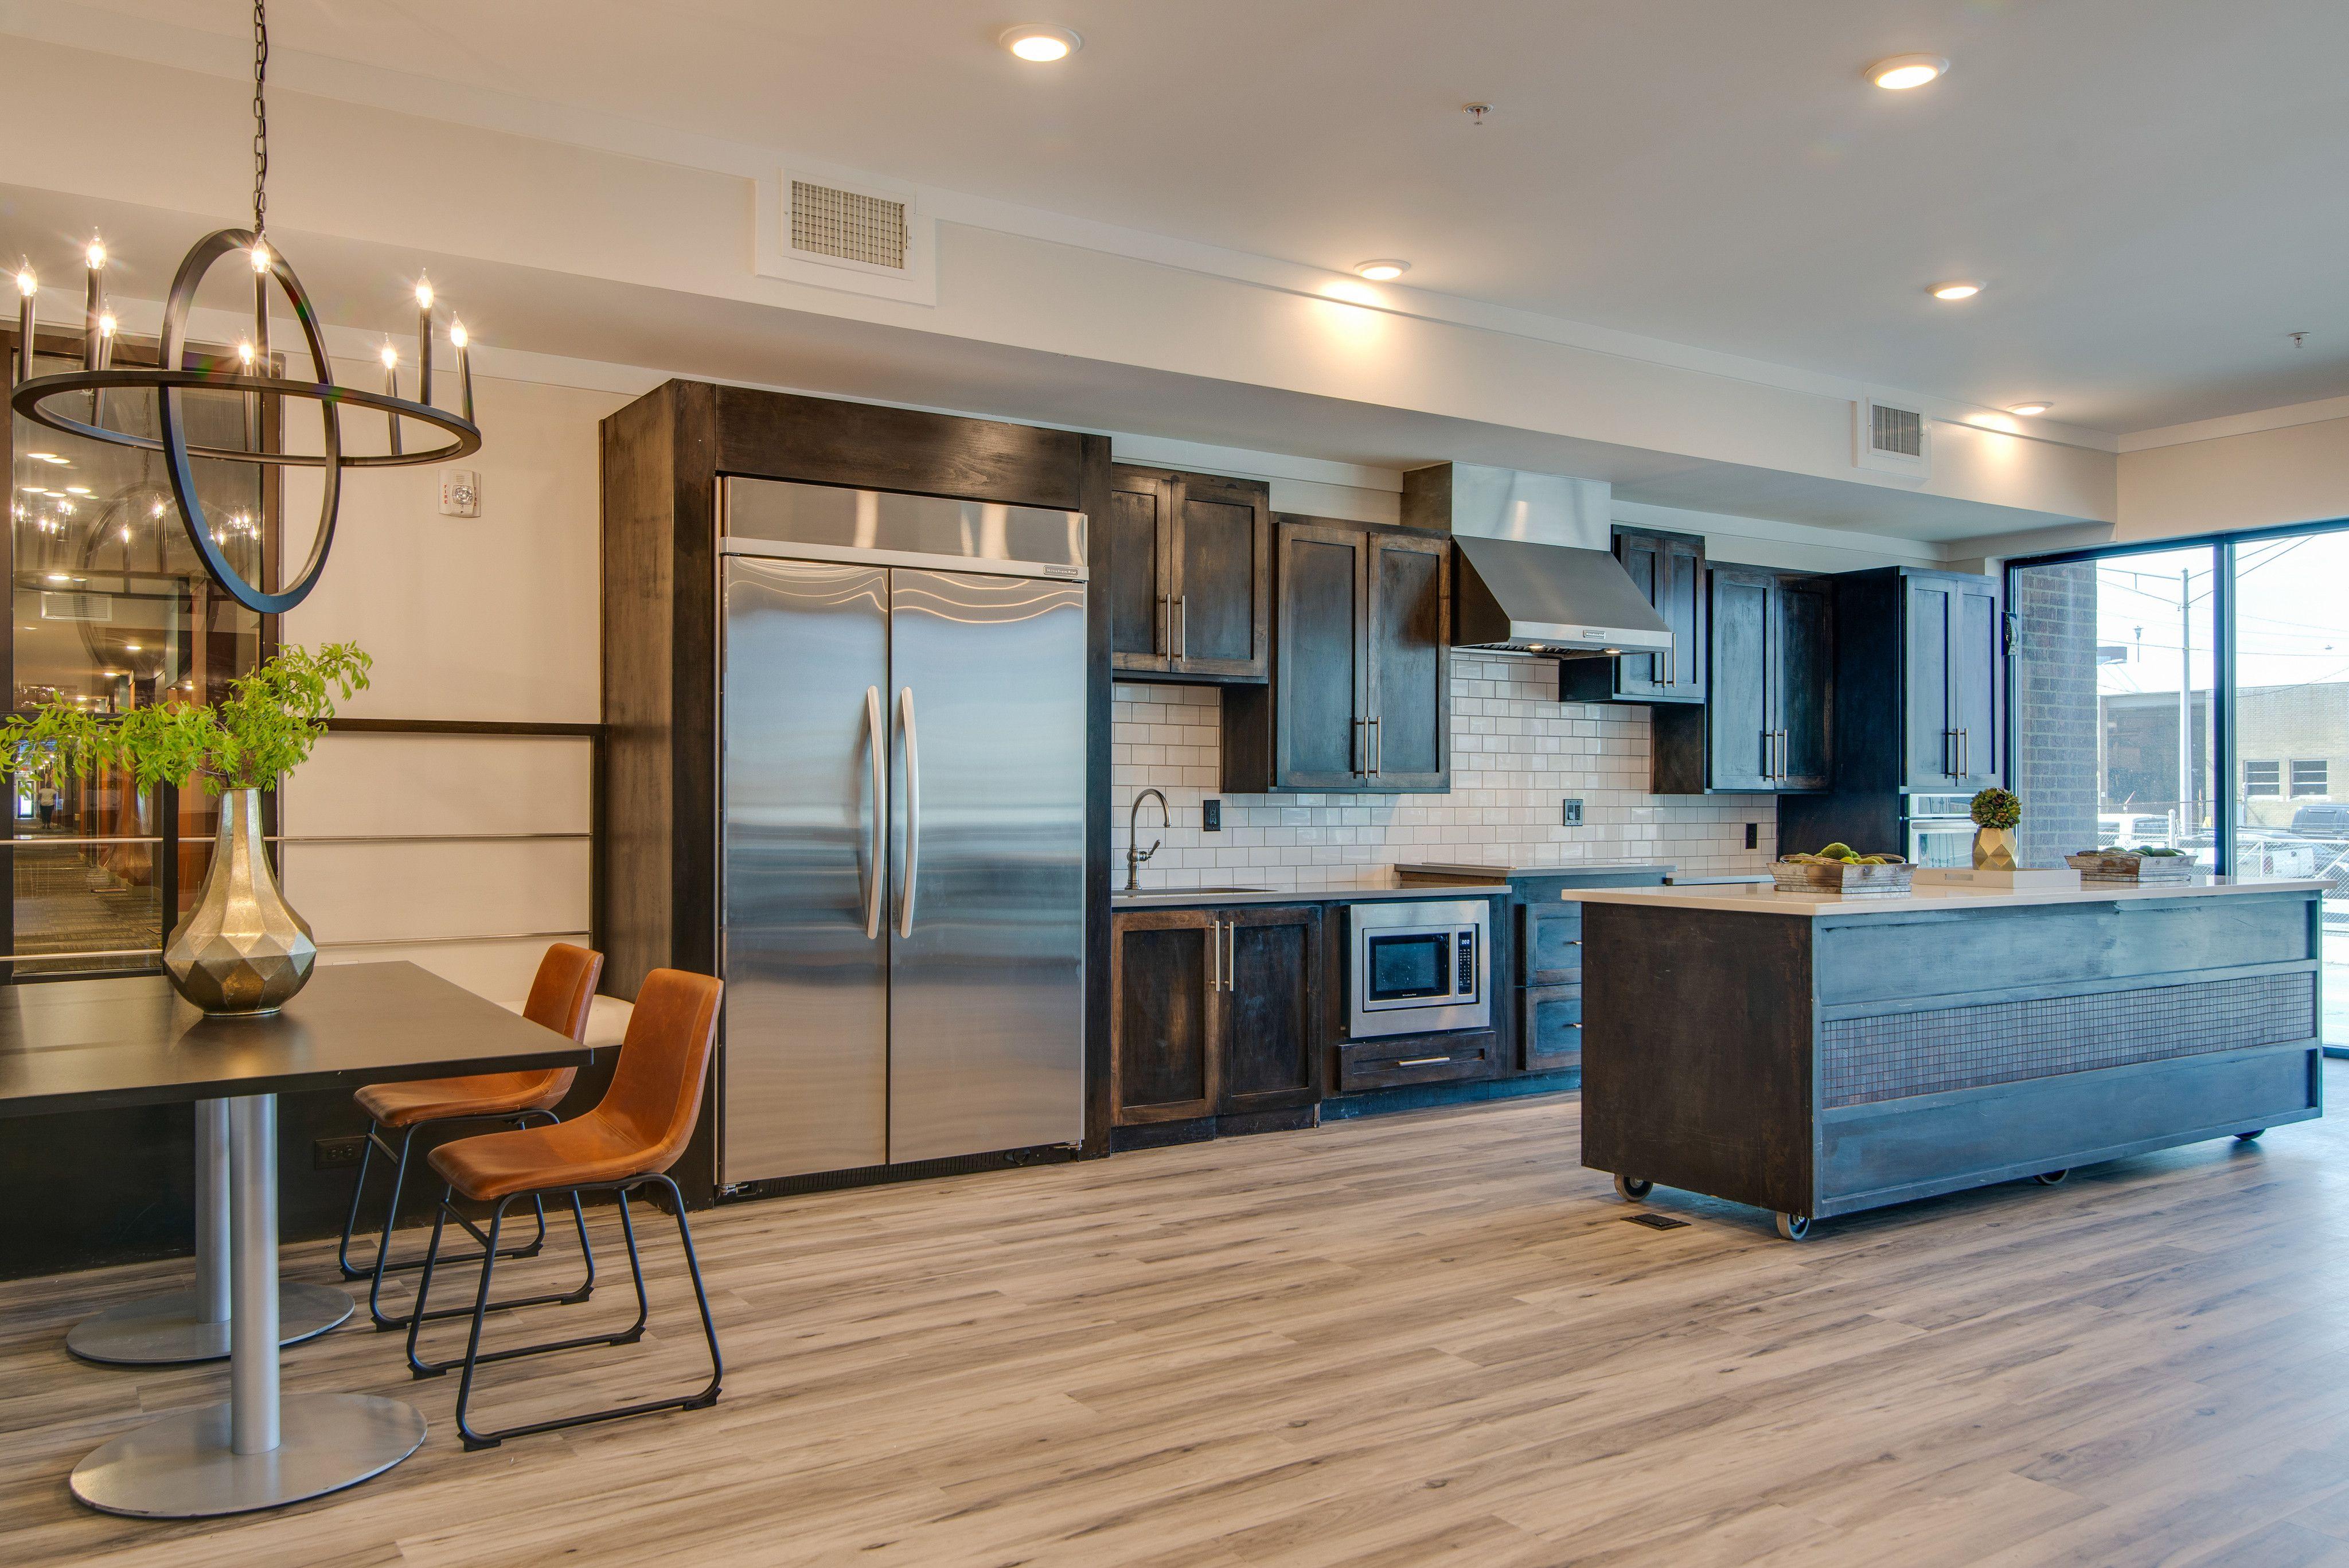 Corporate Kitchen E Communityliving Entertaininge Interior Design Services Nashville